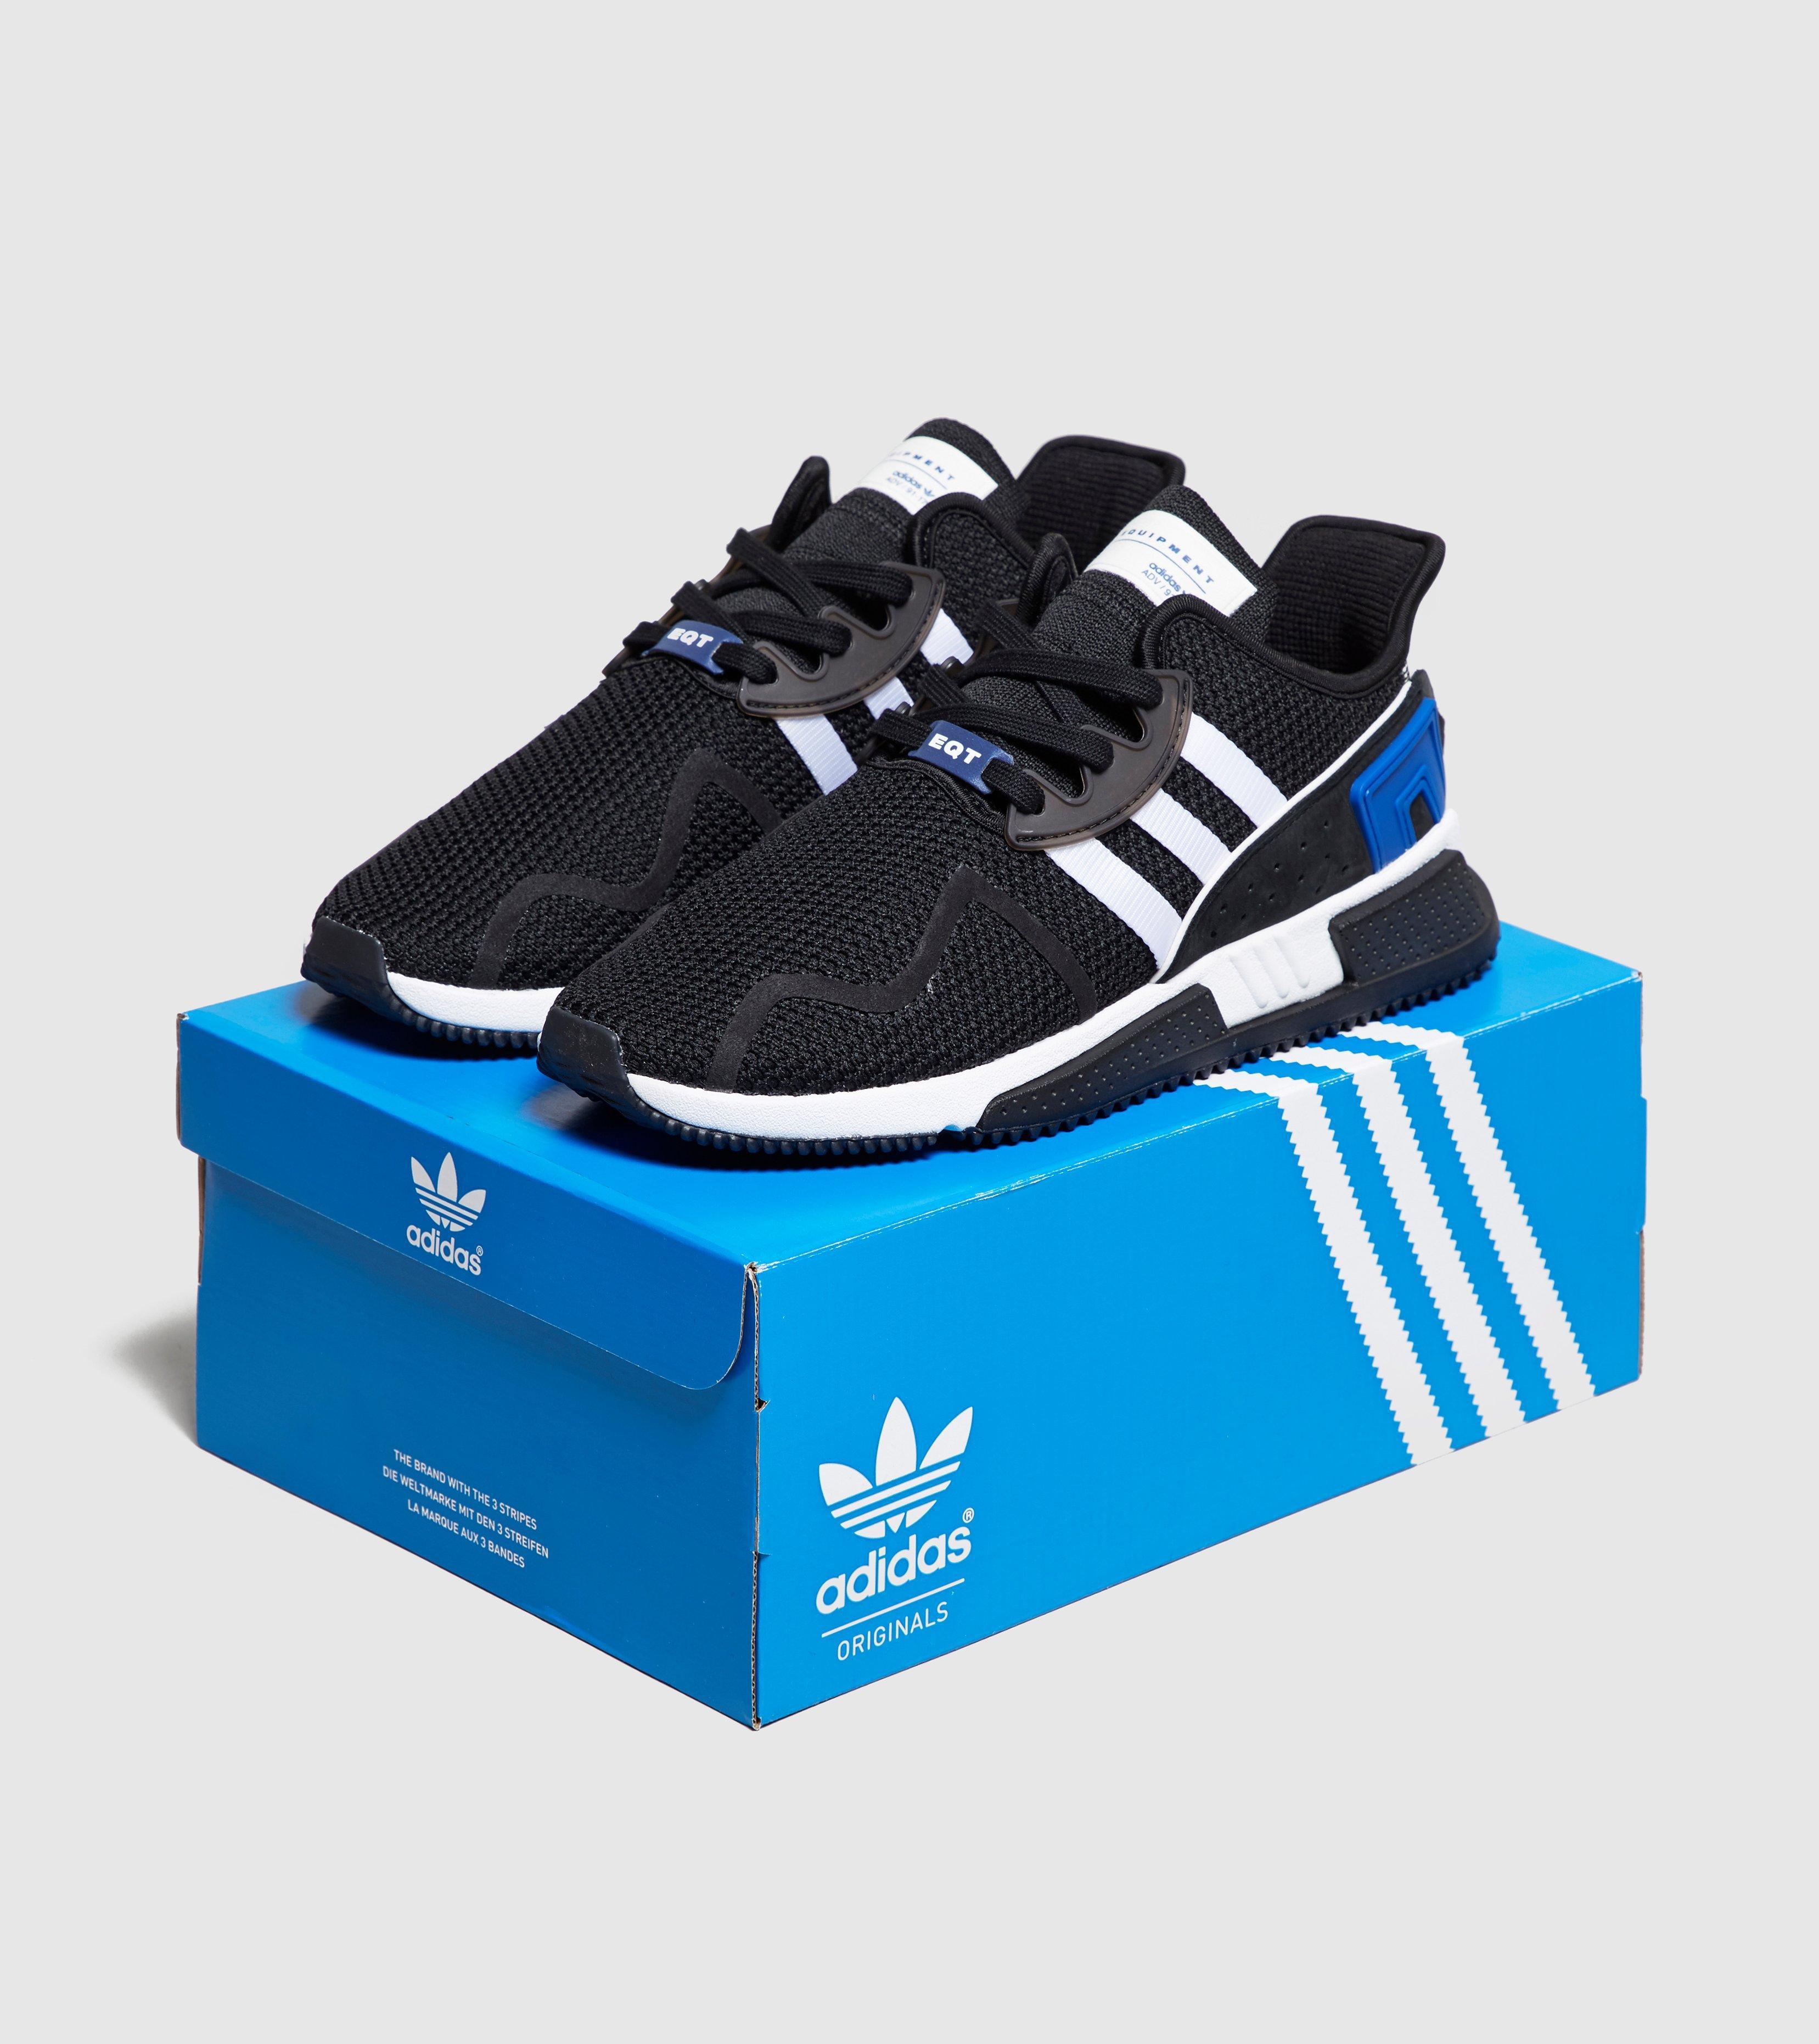 Adidas Men S Originals Jeans Shoes